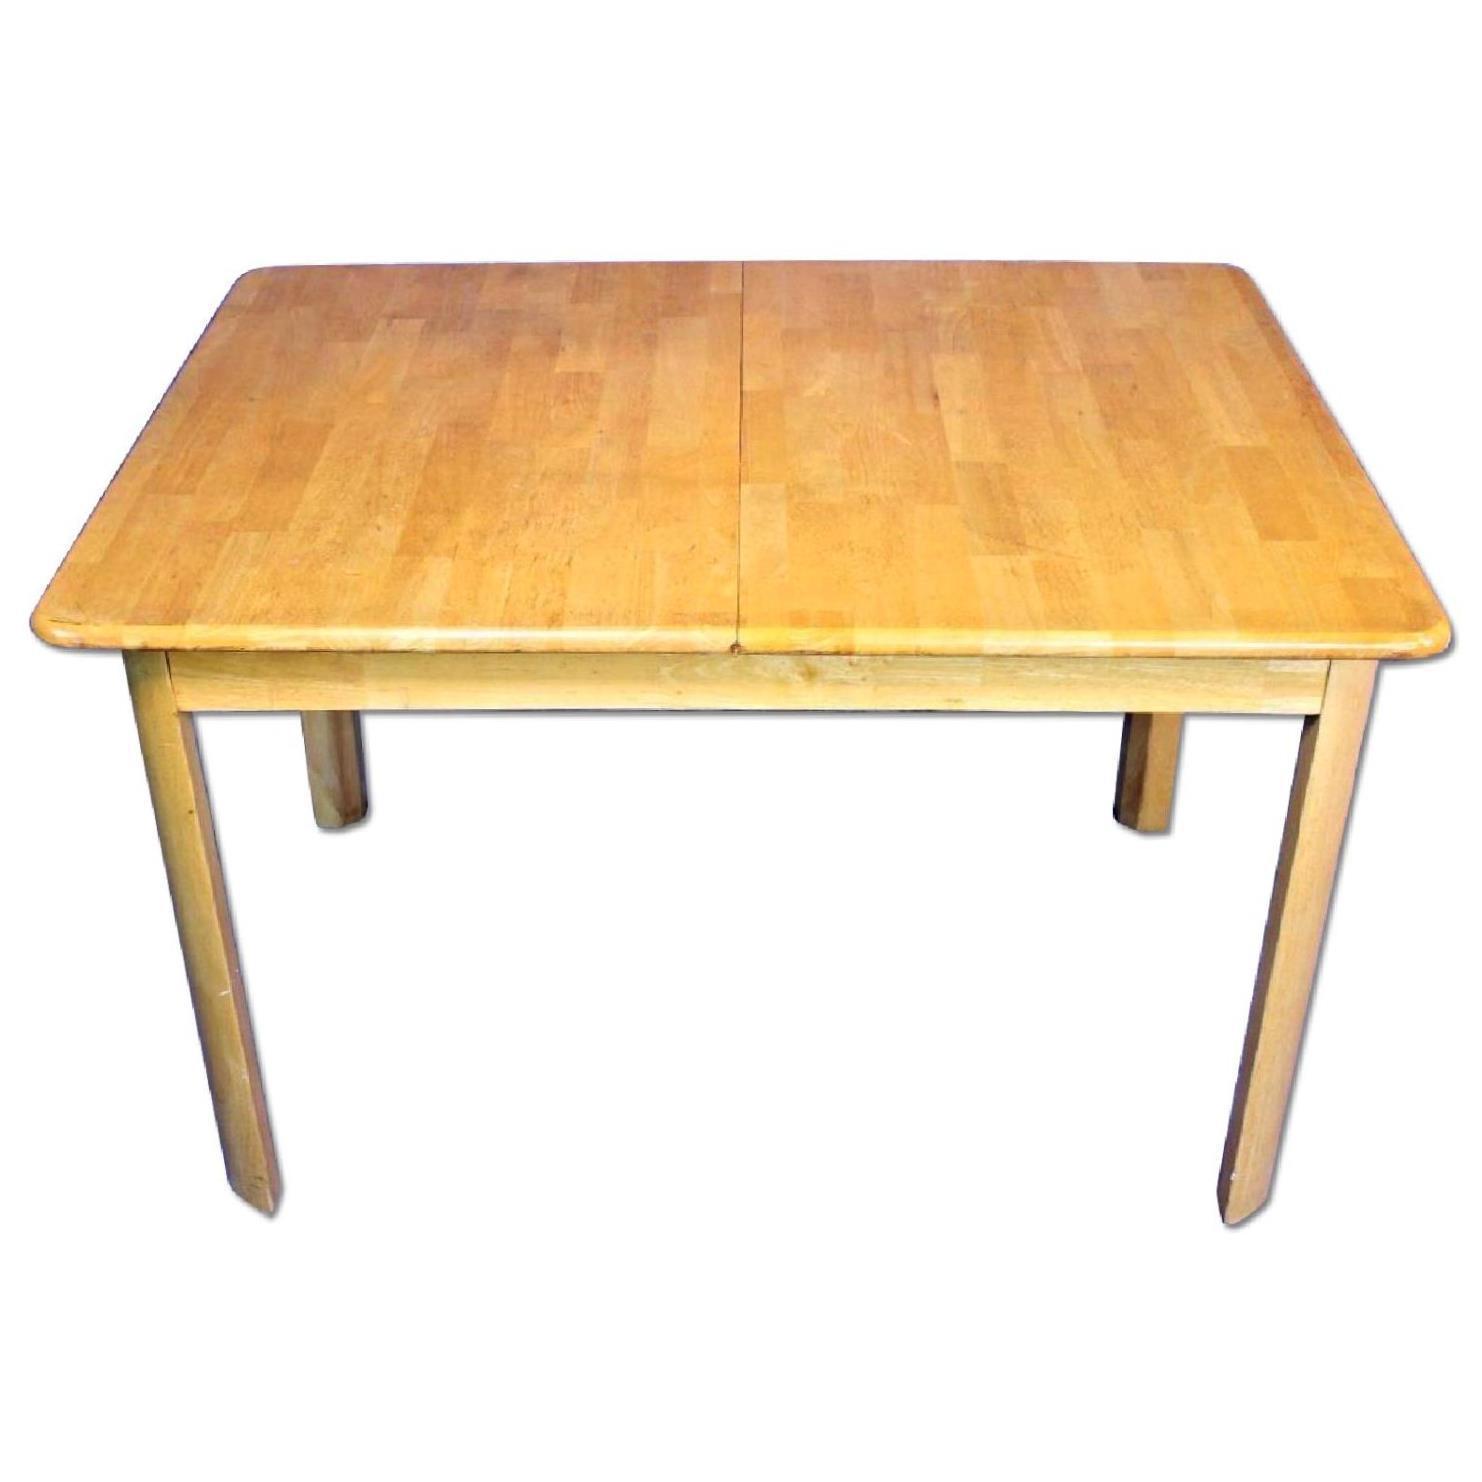 Mid-Century Modern Wooden Dining Kitchen Table